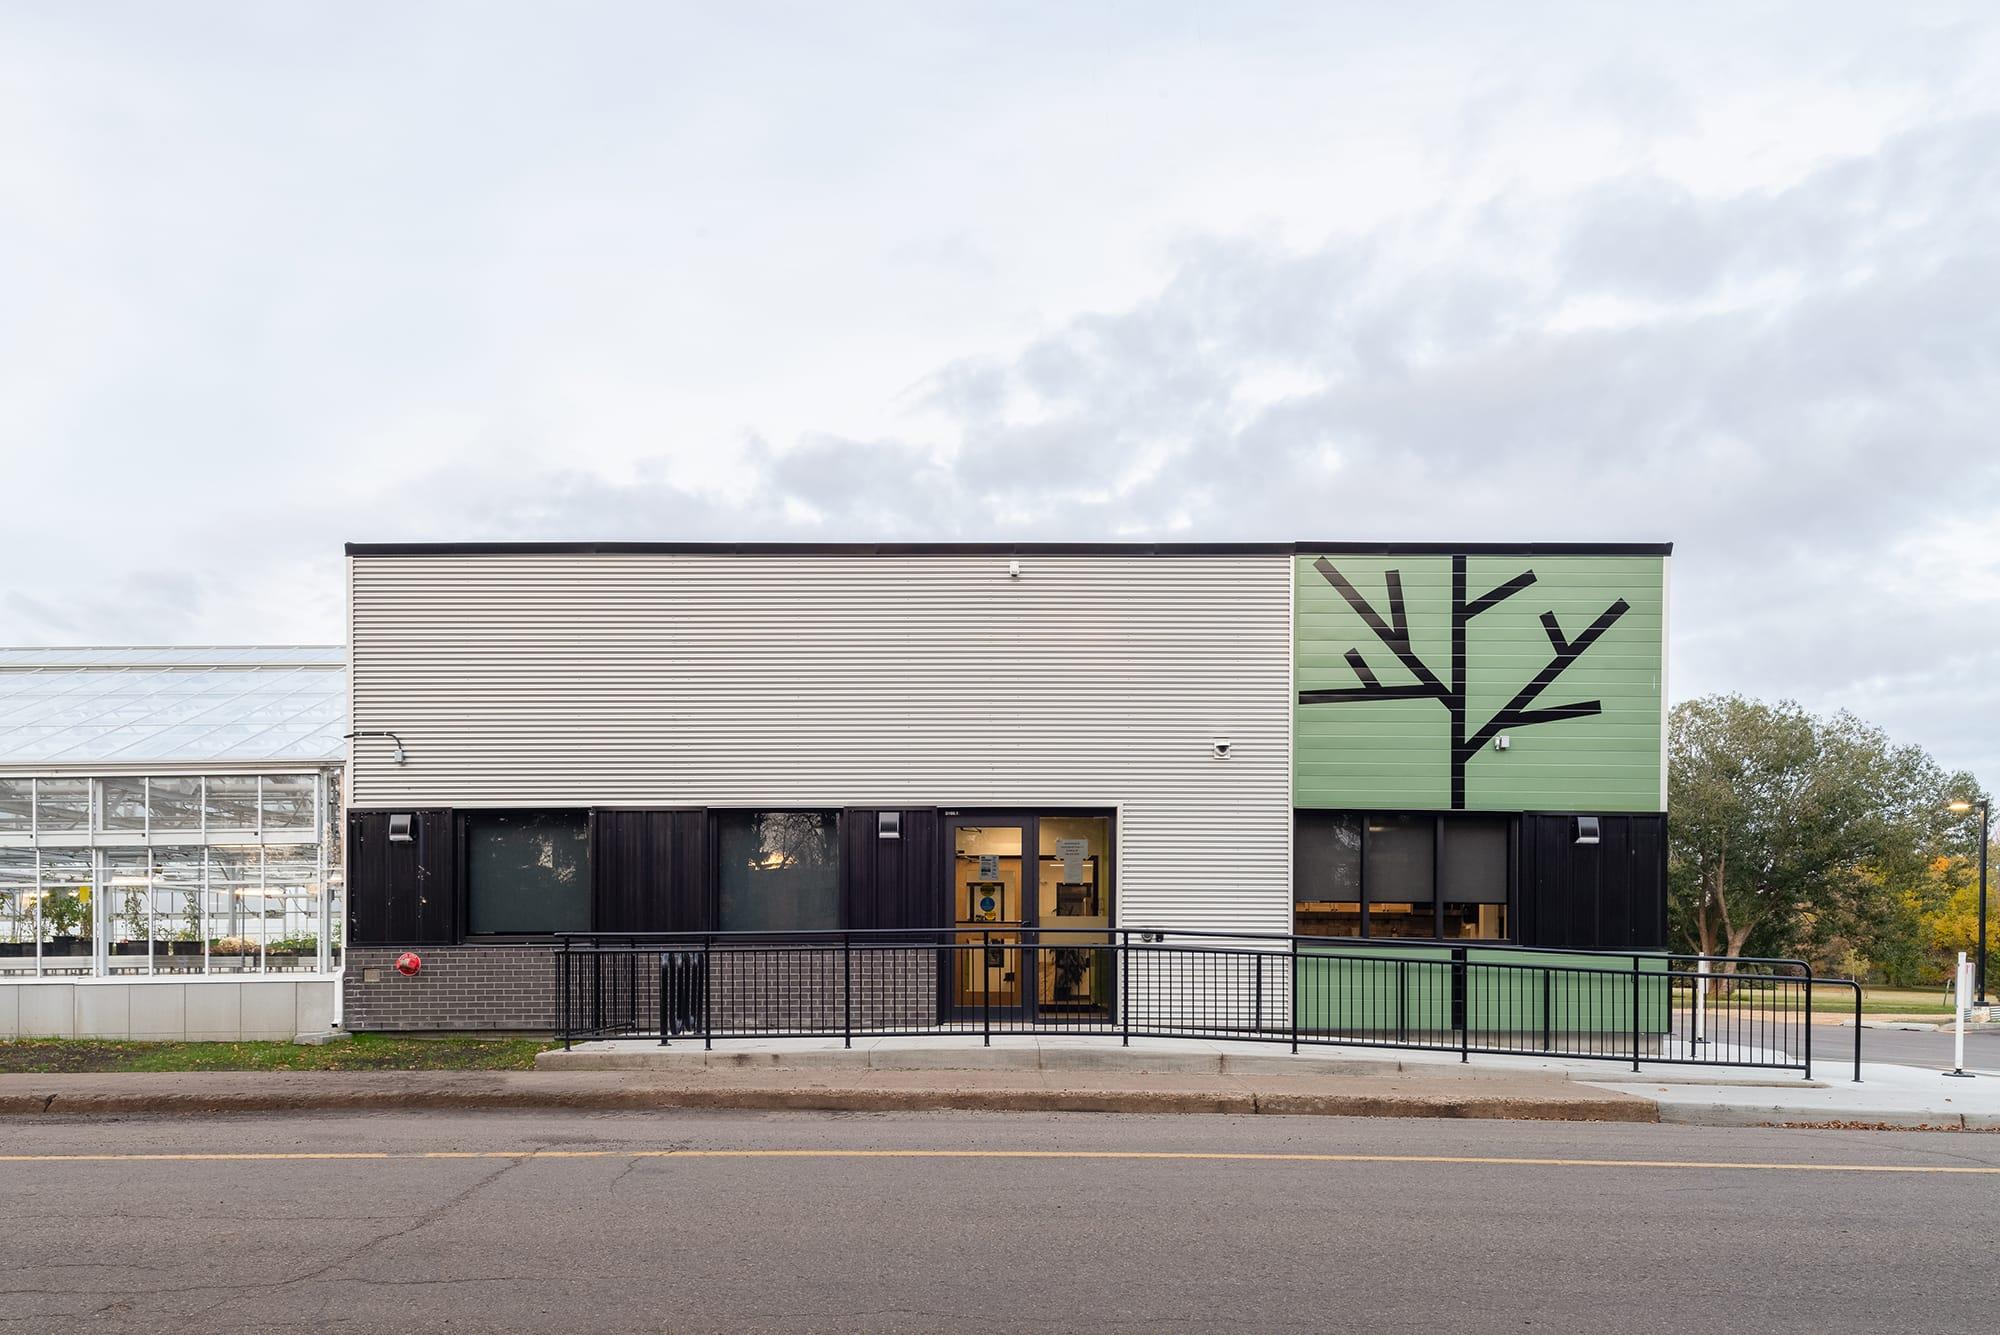 Alberta Hospital Edmonton Greenhouse exterior